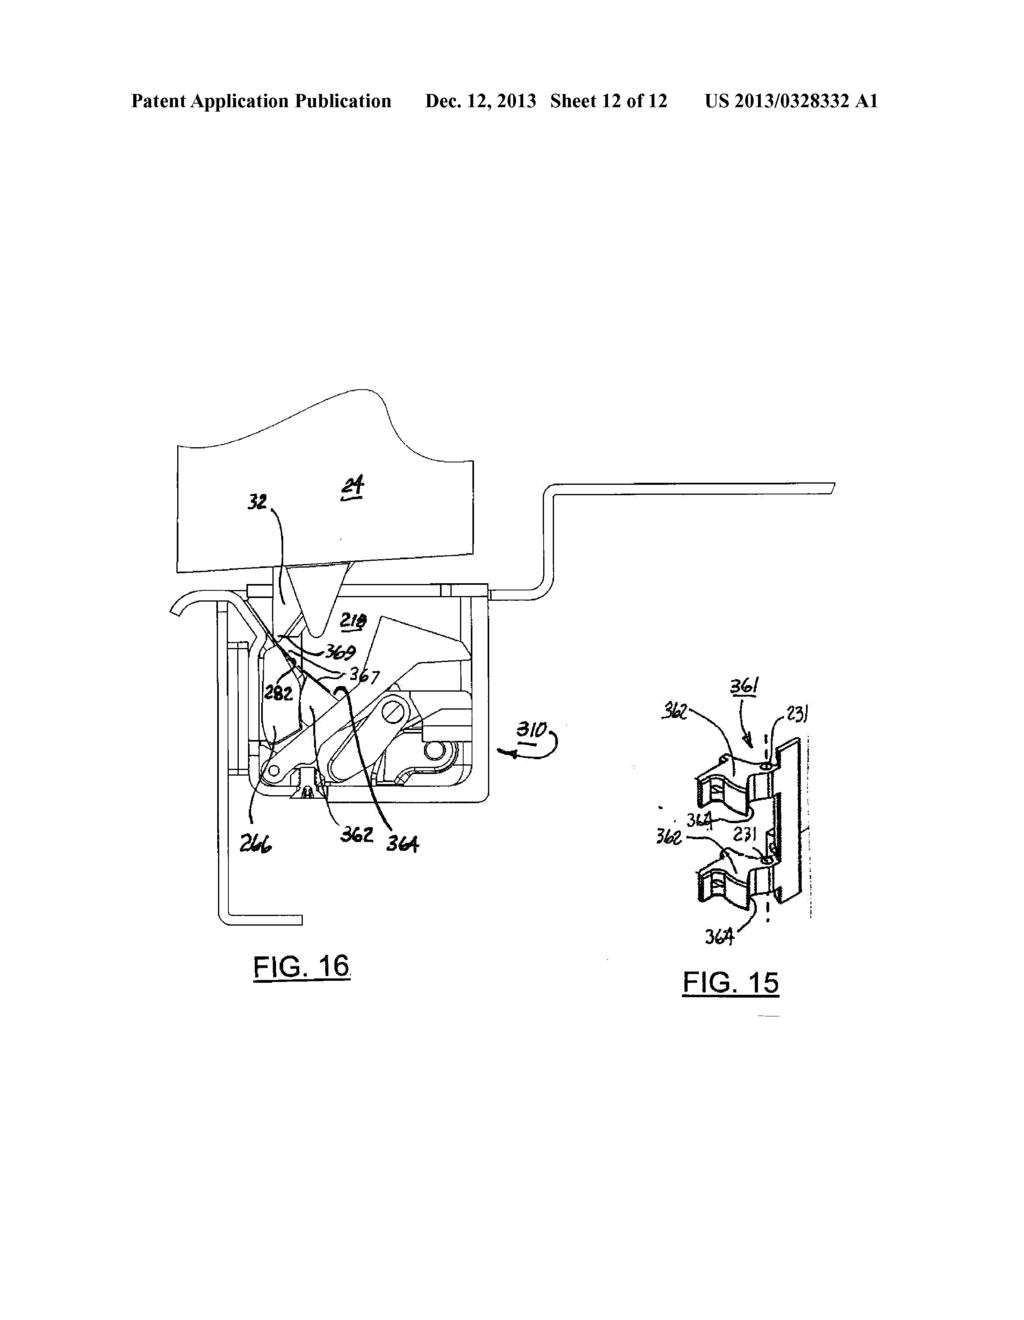 electric door strike having a dead latch release platform actuated rh patentsencyclopedia com Deadlatch Assembly Parts of a Deadlatch